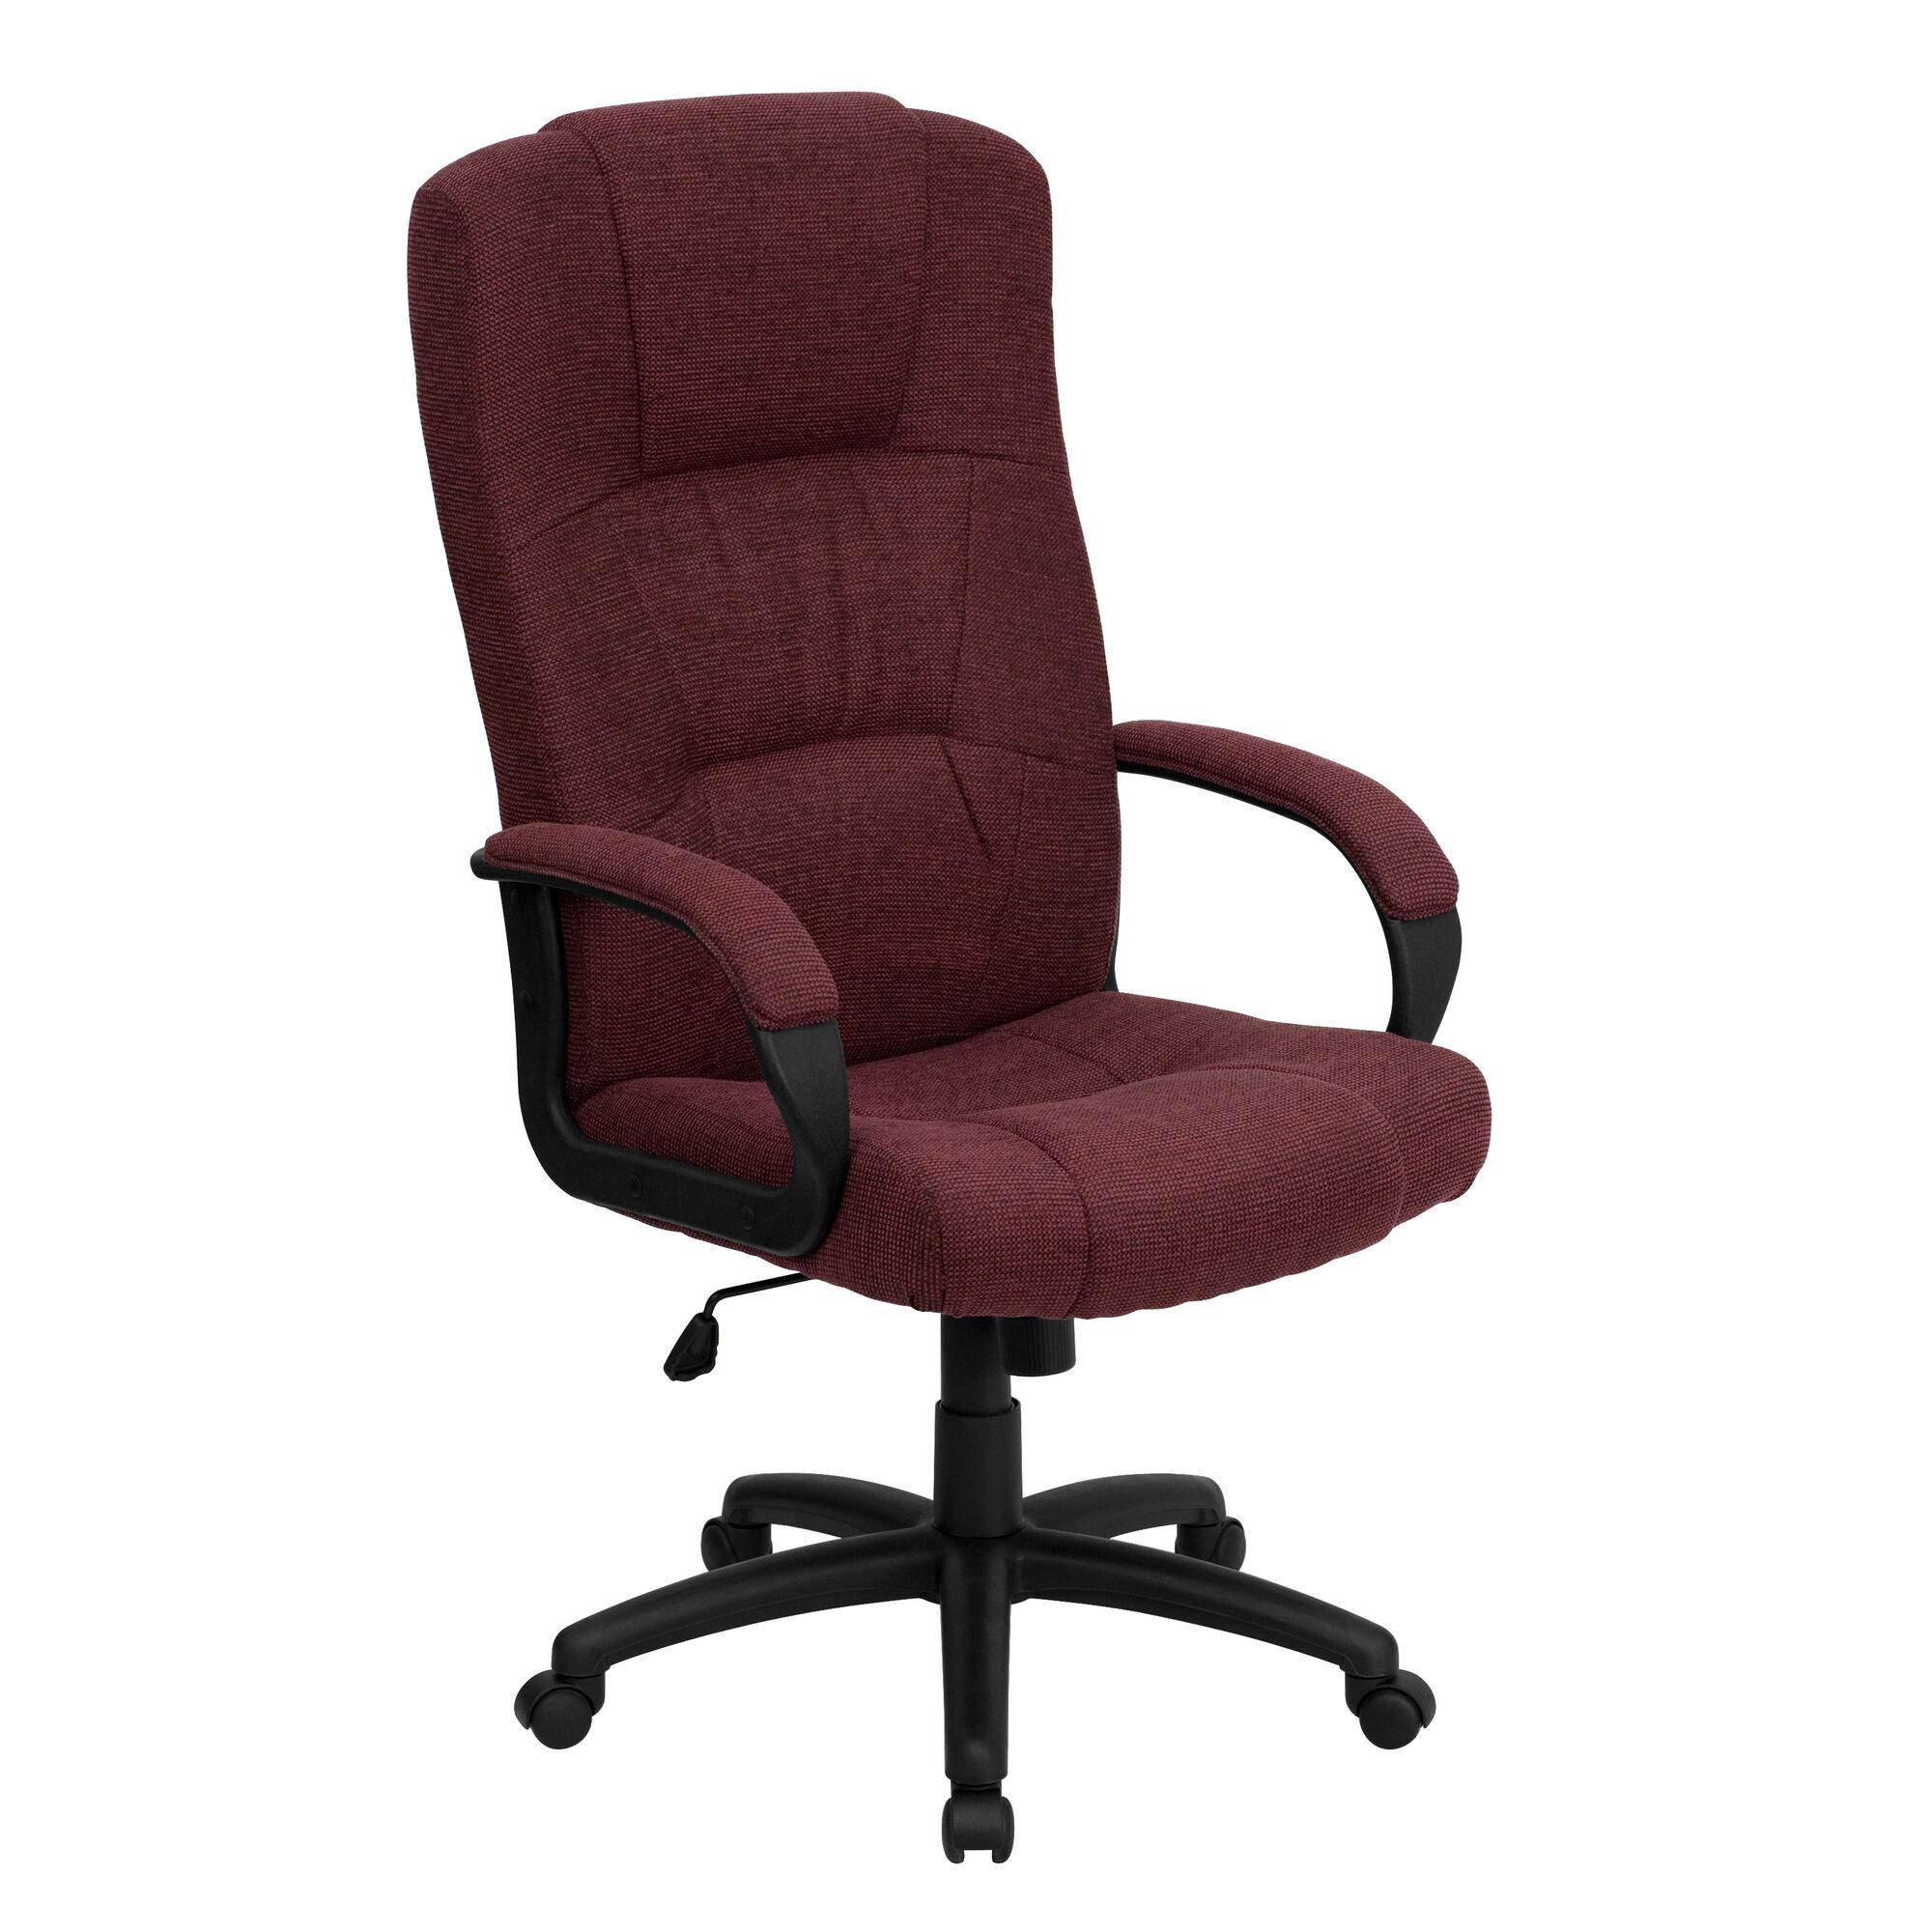 Flash Furniture BT 9022 BY GG at Bizchair